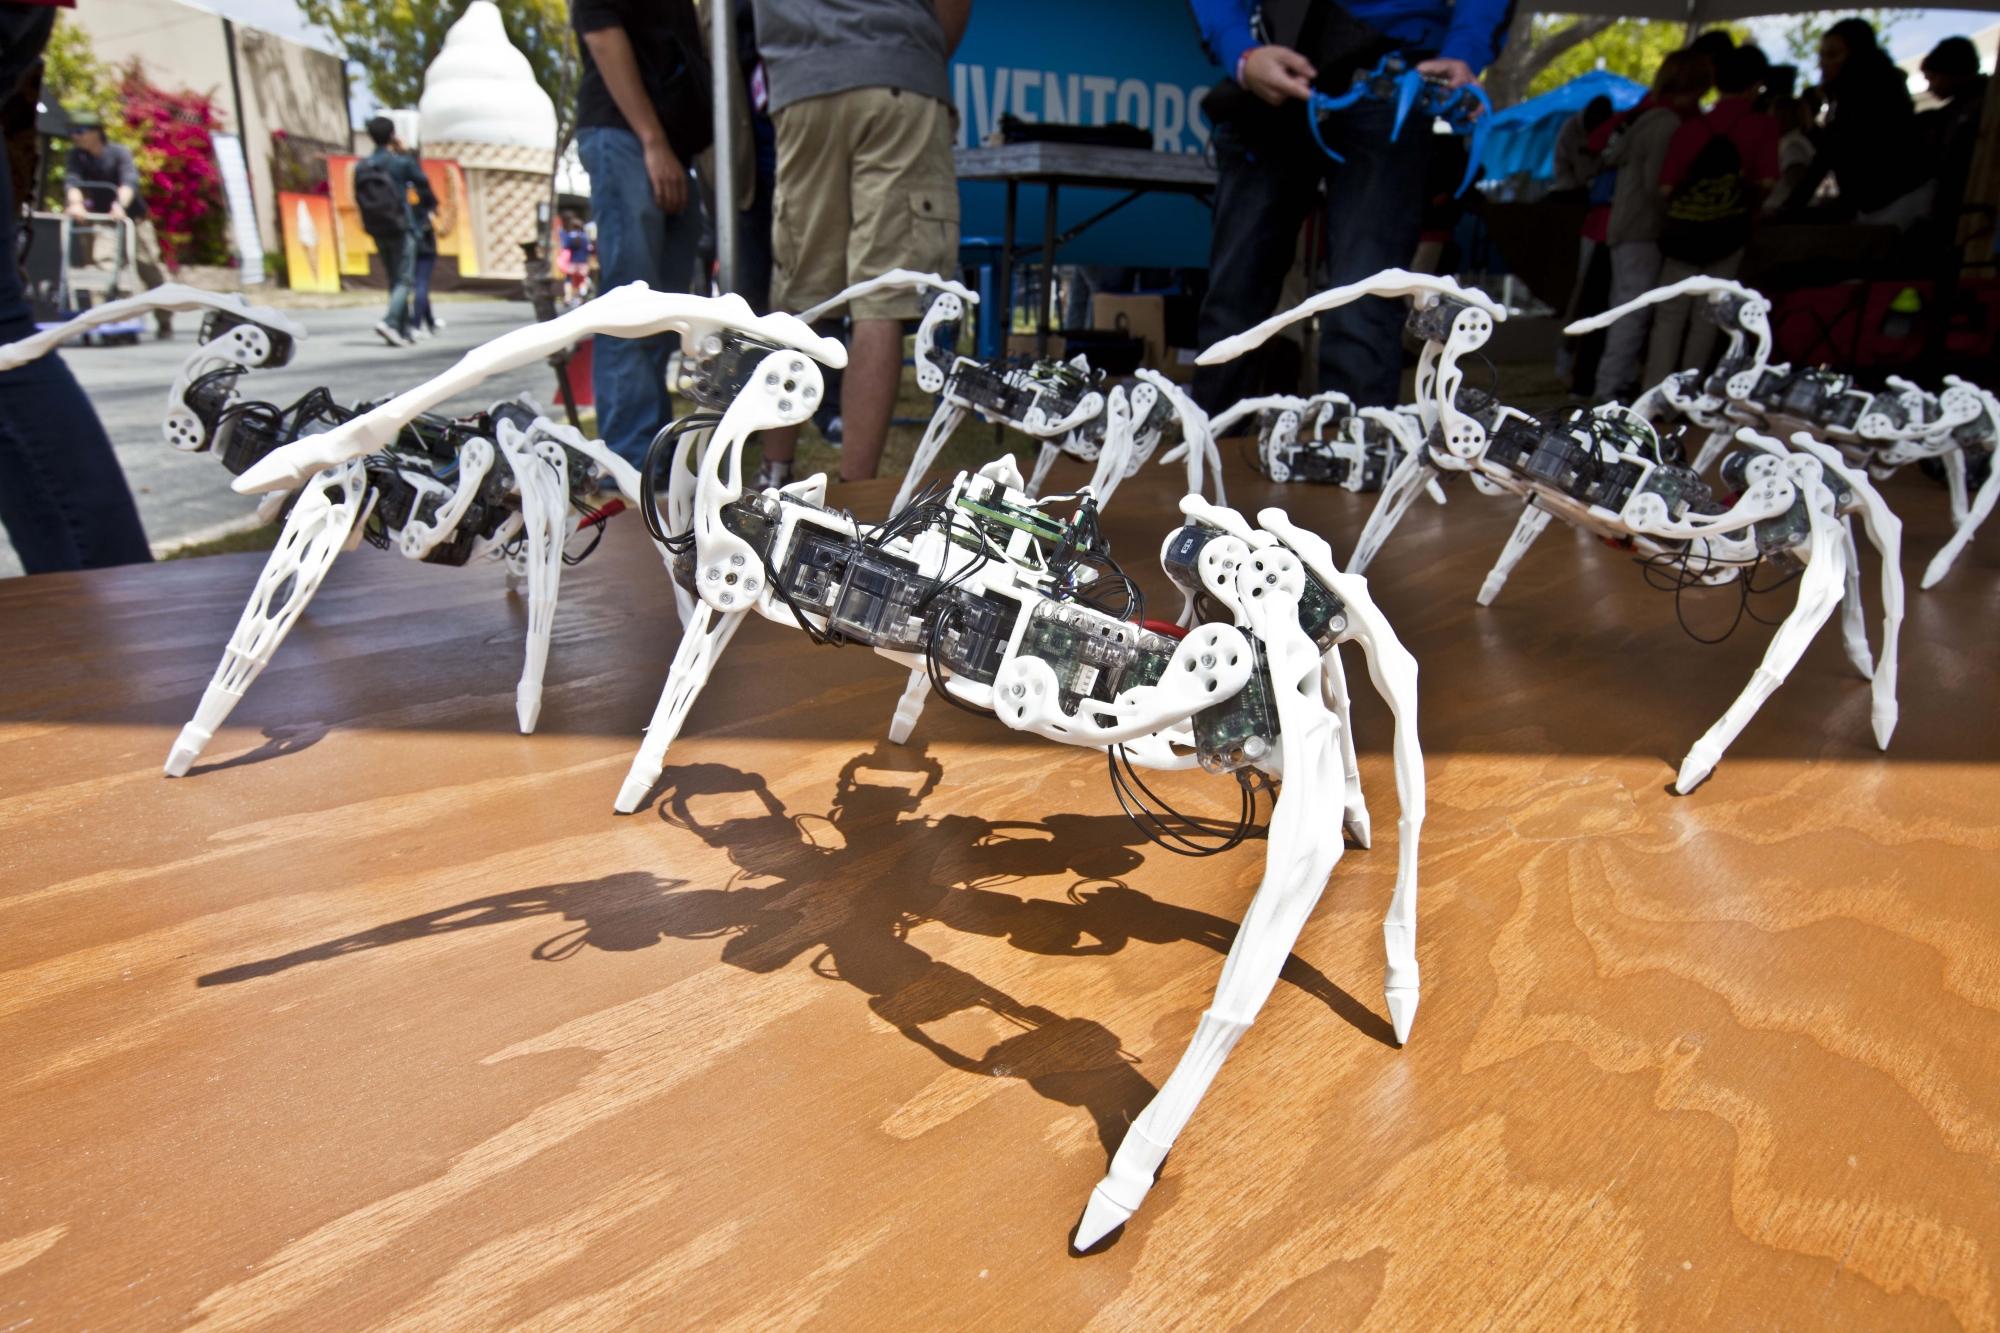 2015 Intel® Maker Faire